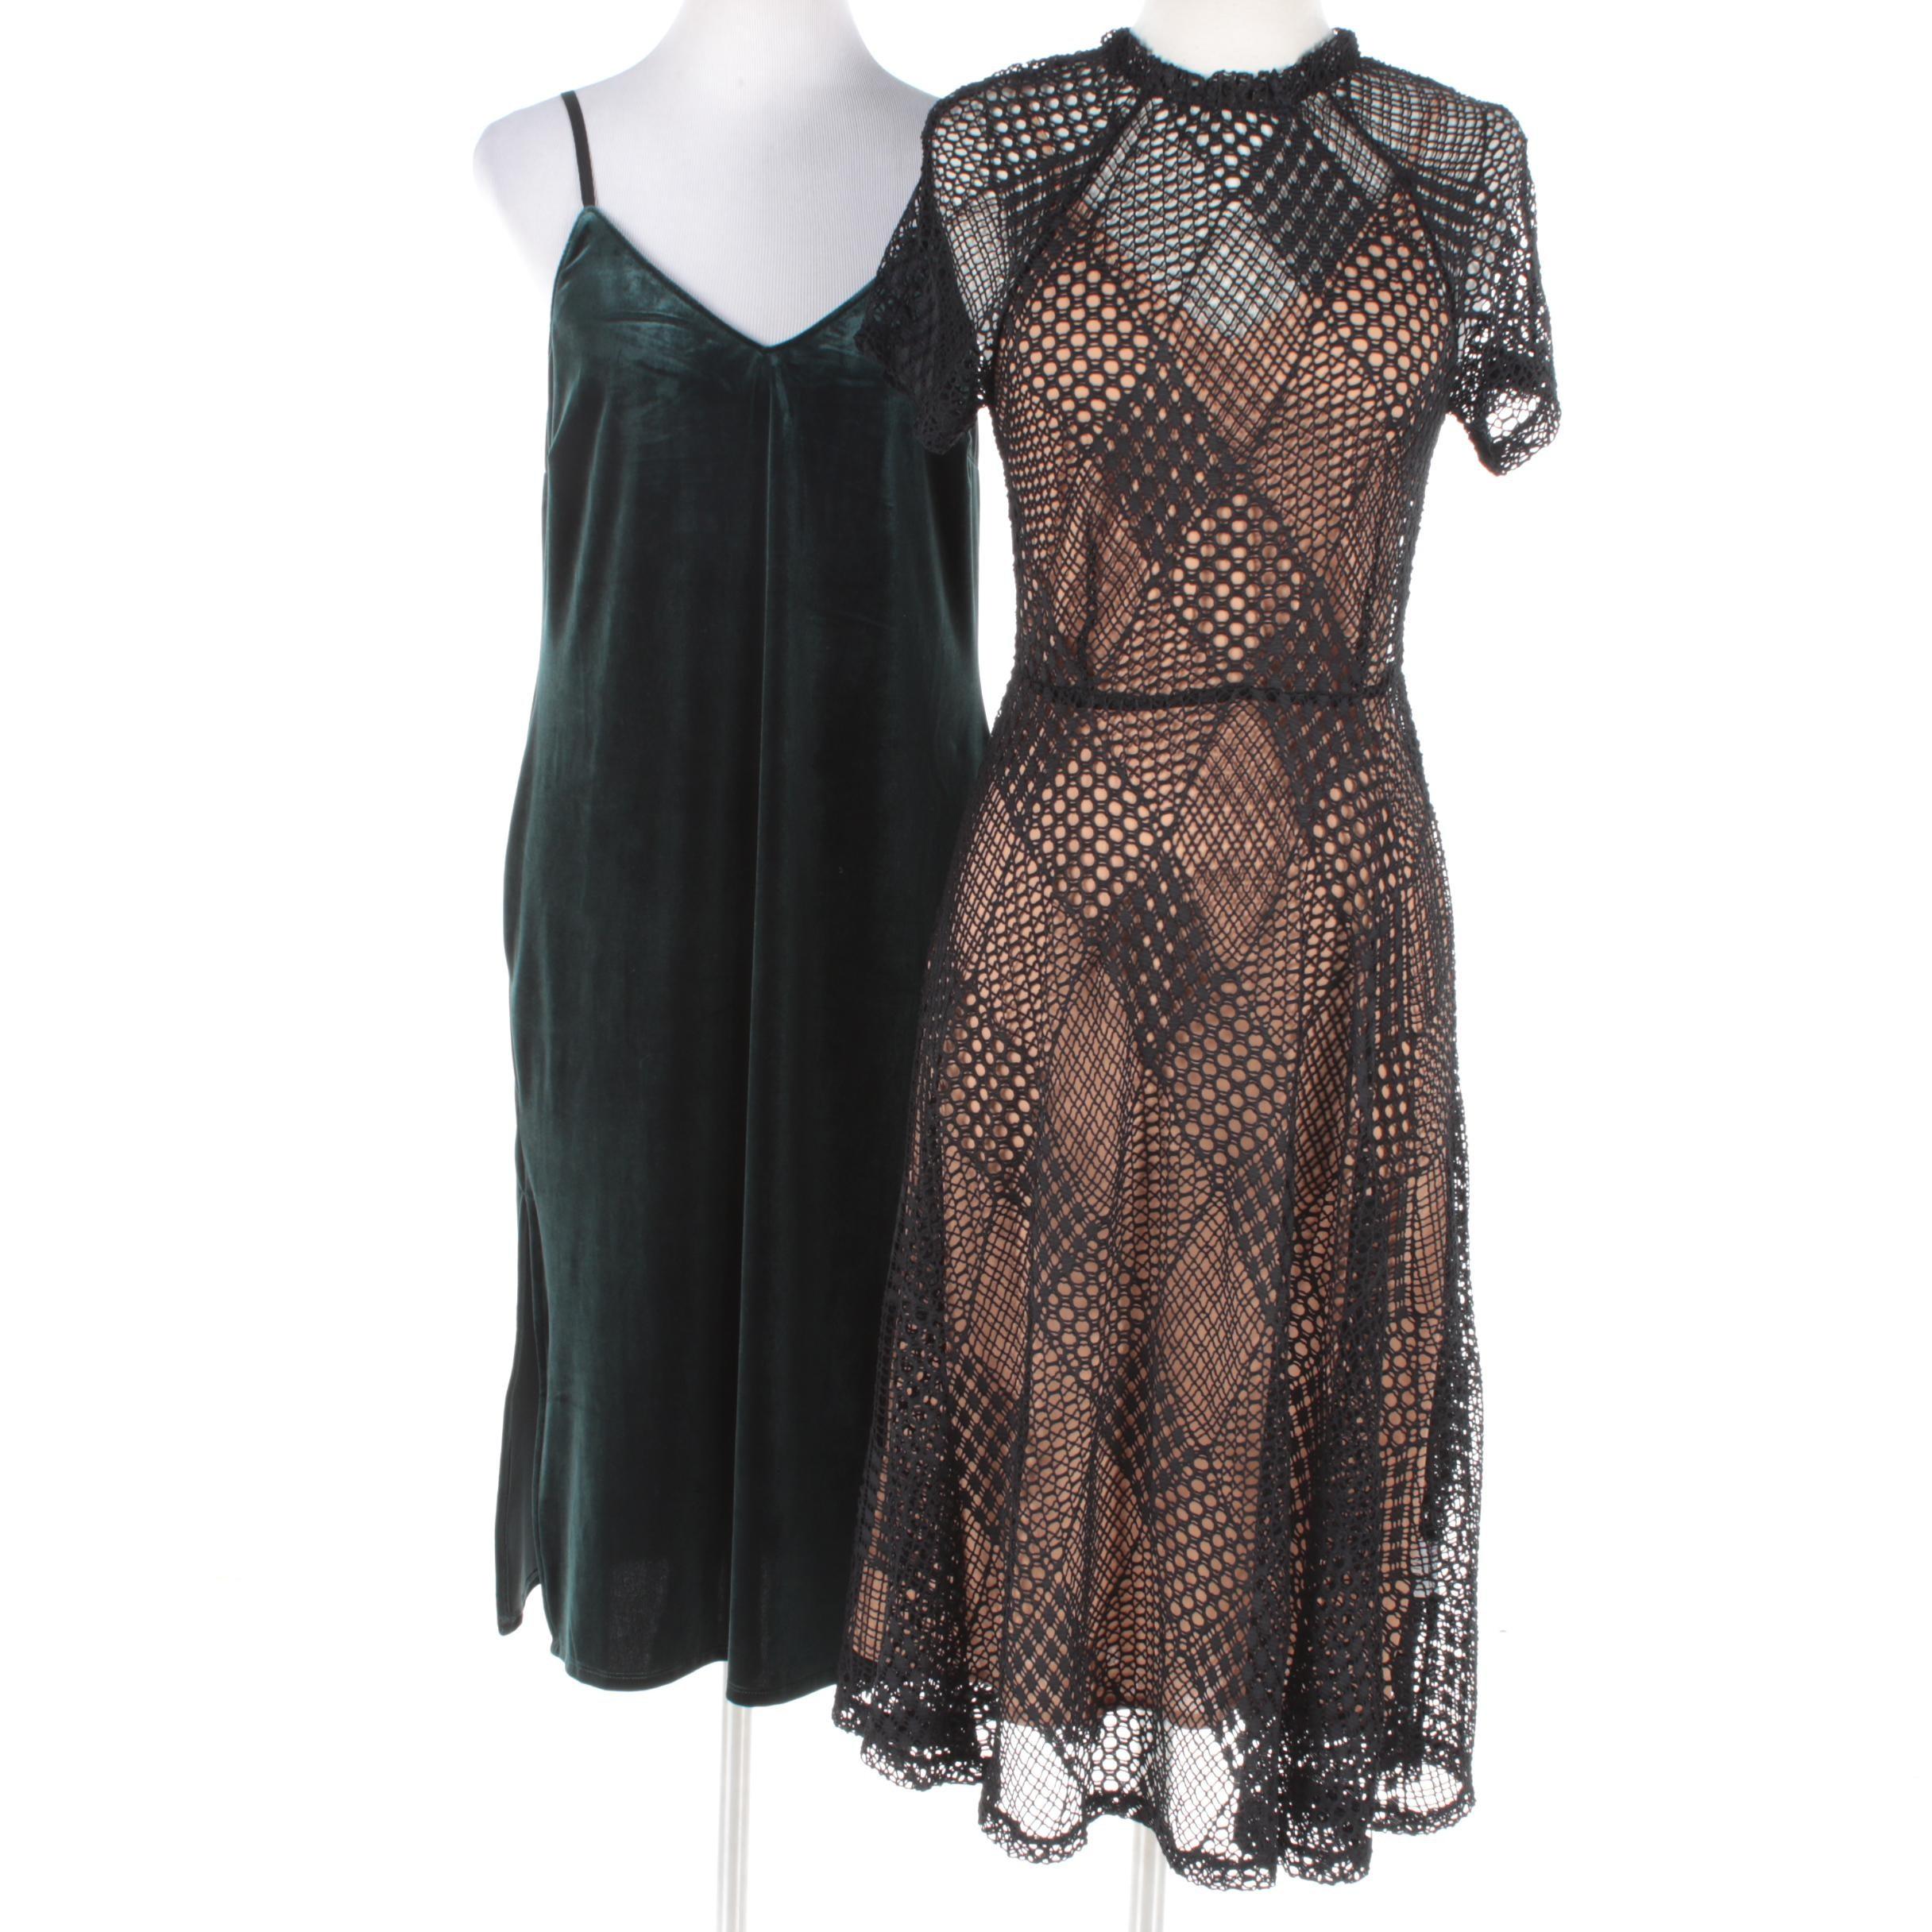 Sanctuary Velveteen Dress and Goldie Black Overlay Dress